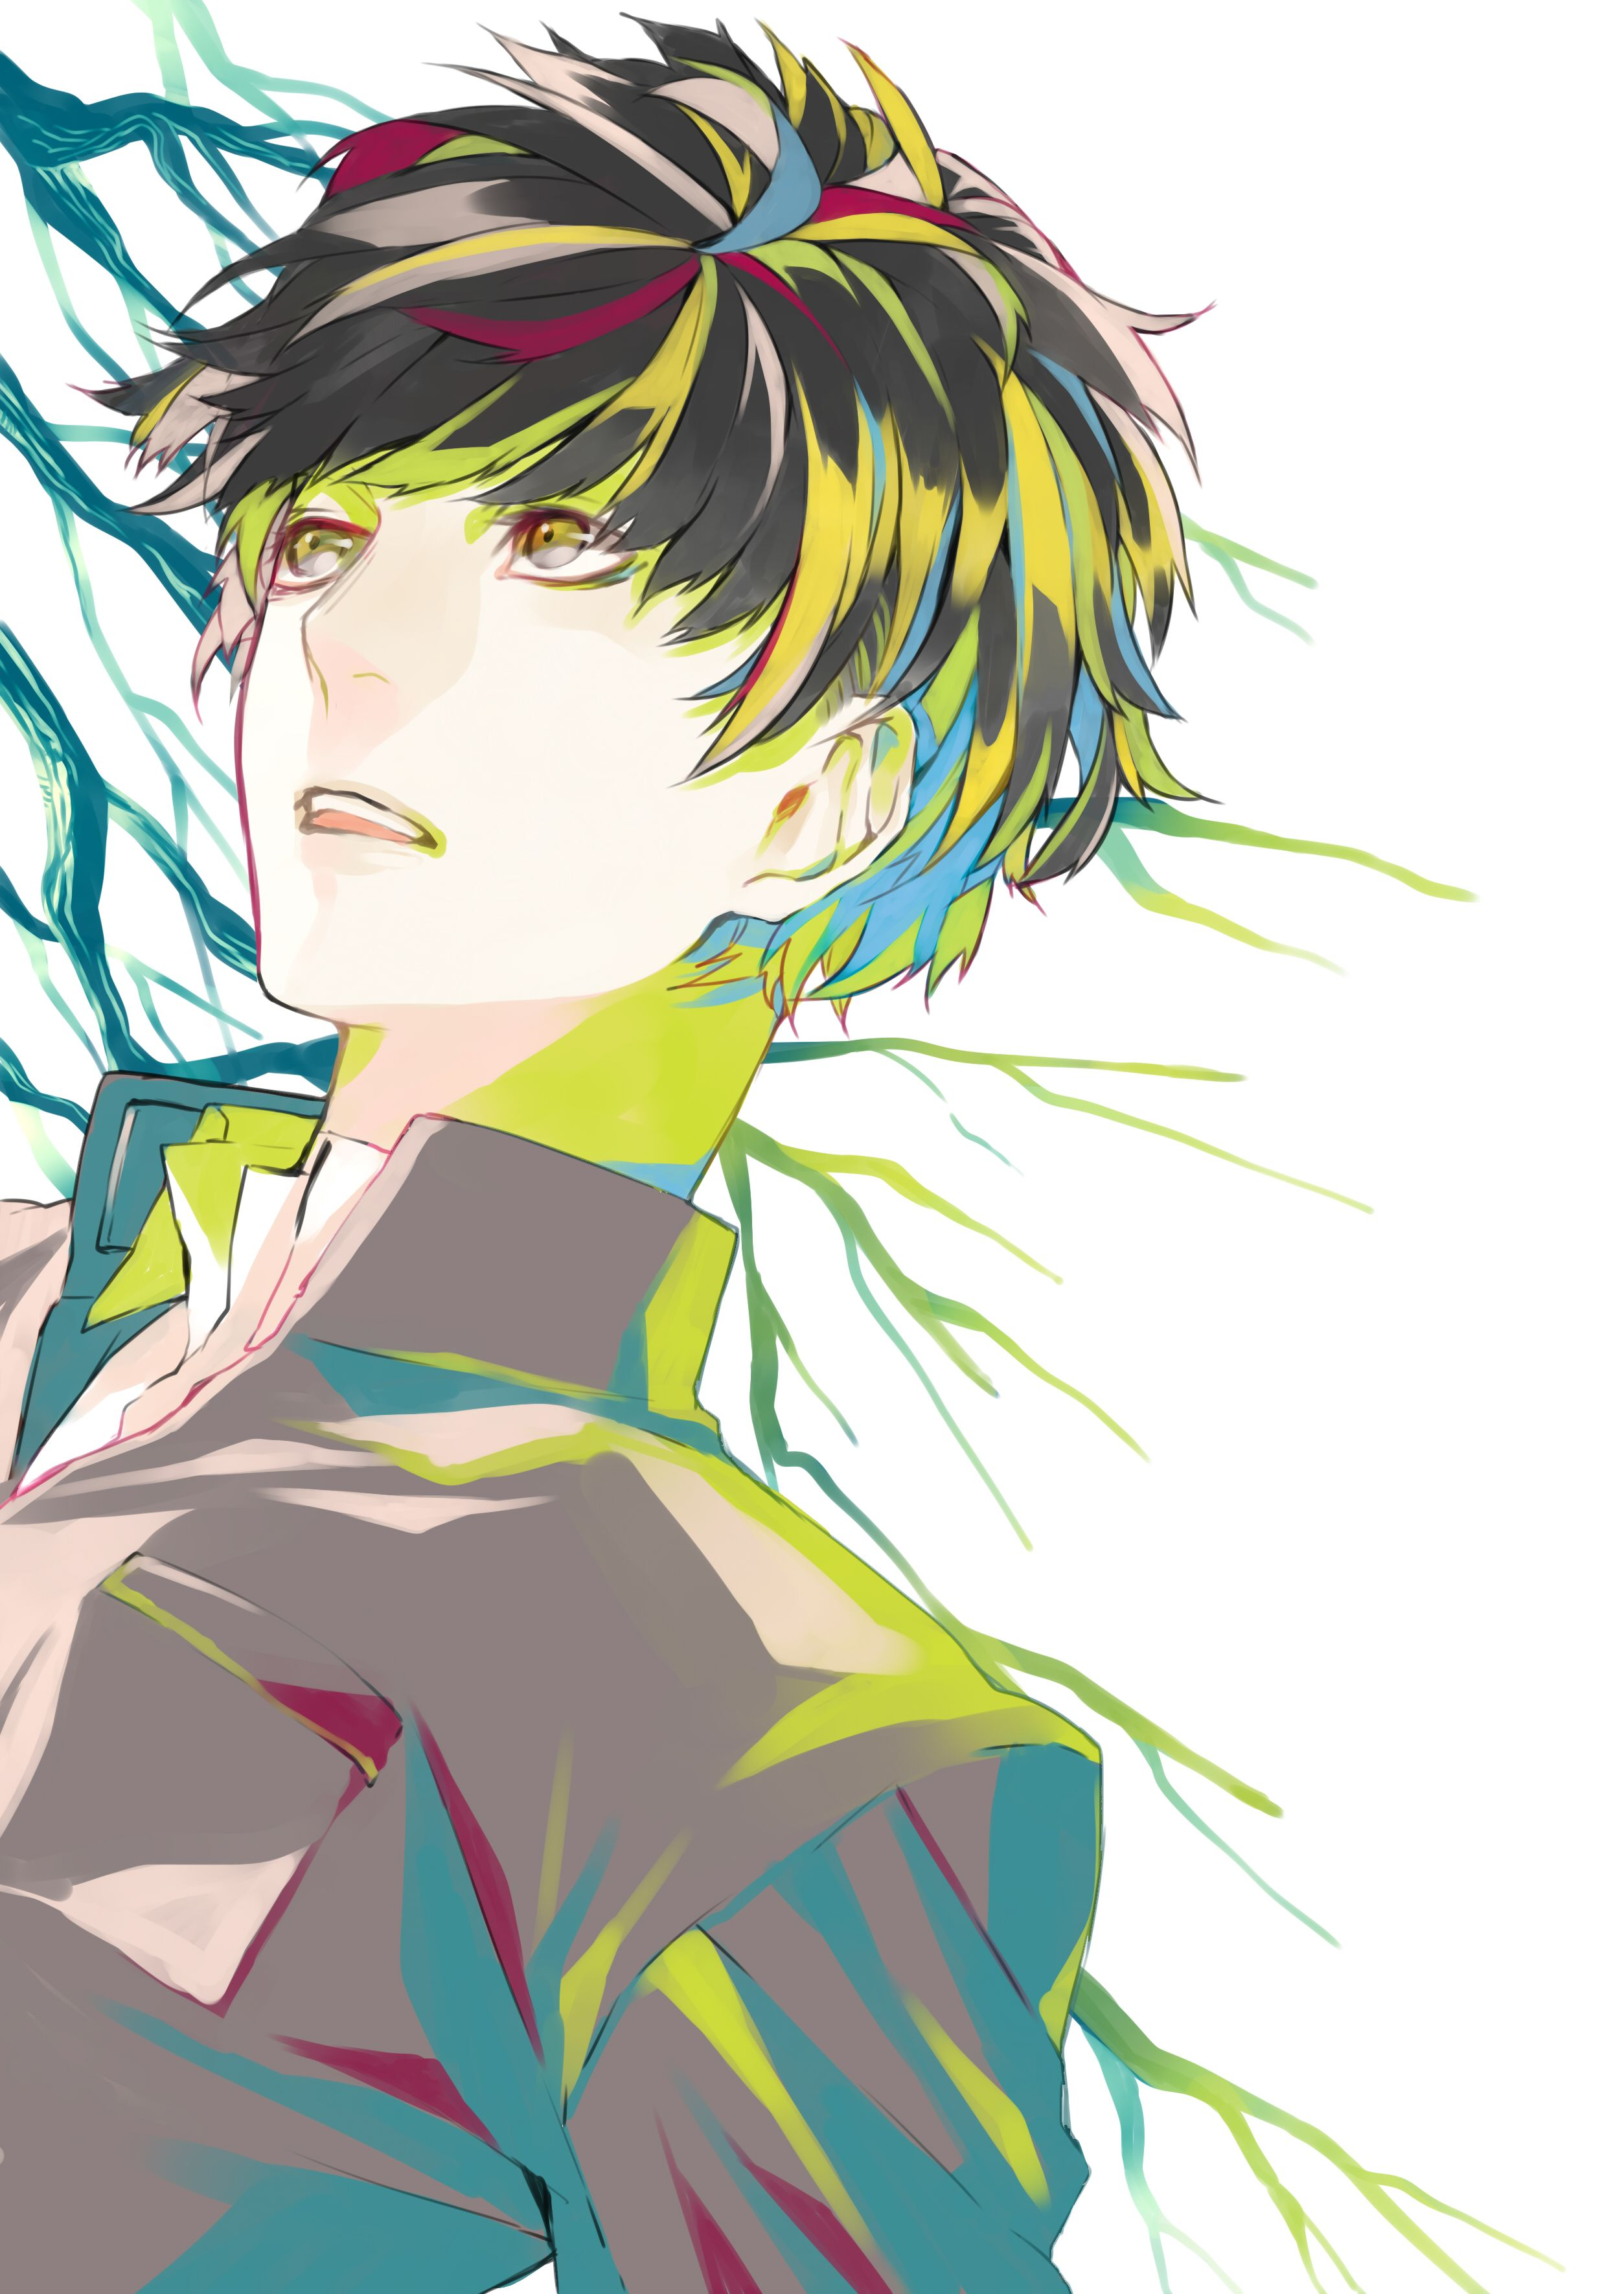 TagsApplepiefasna, Multicolored Eyes Anime